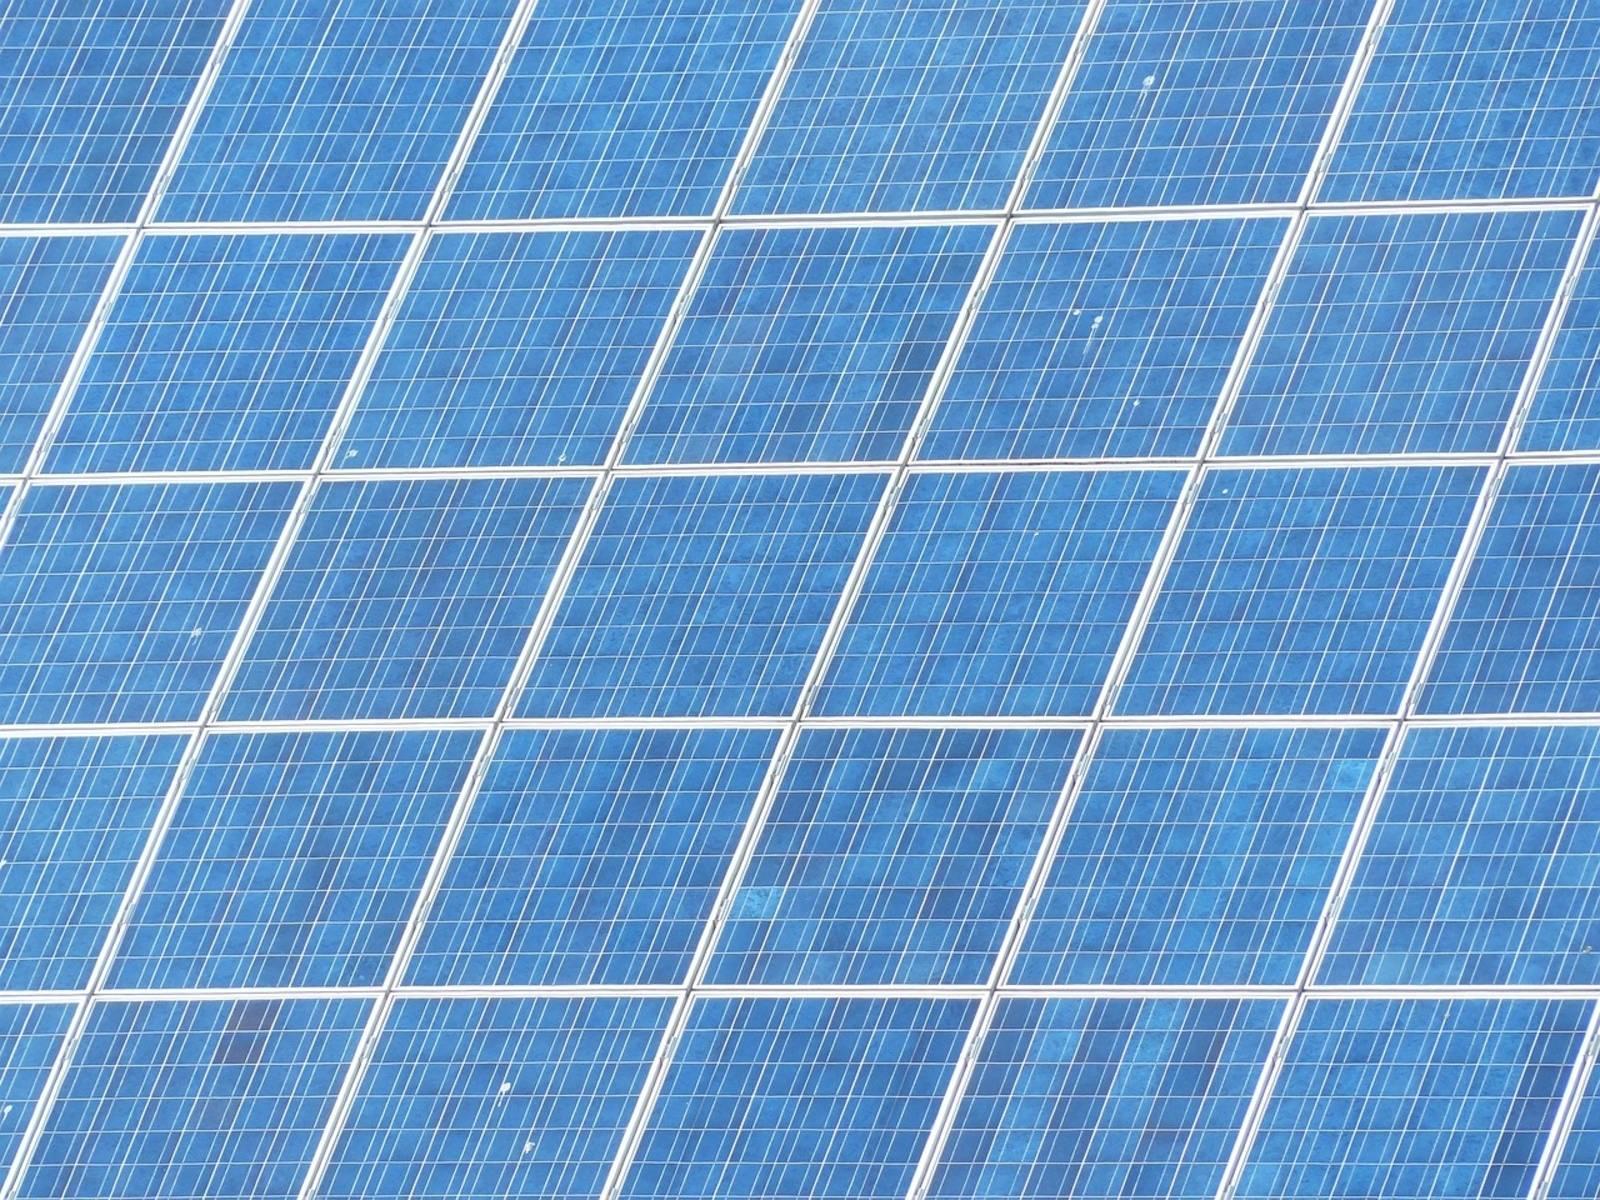 Solaranlagen mieten